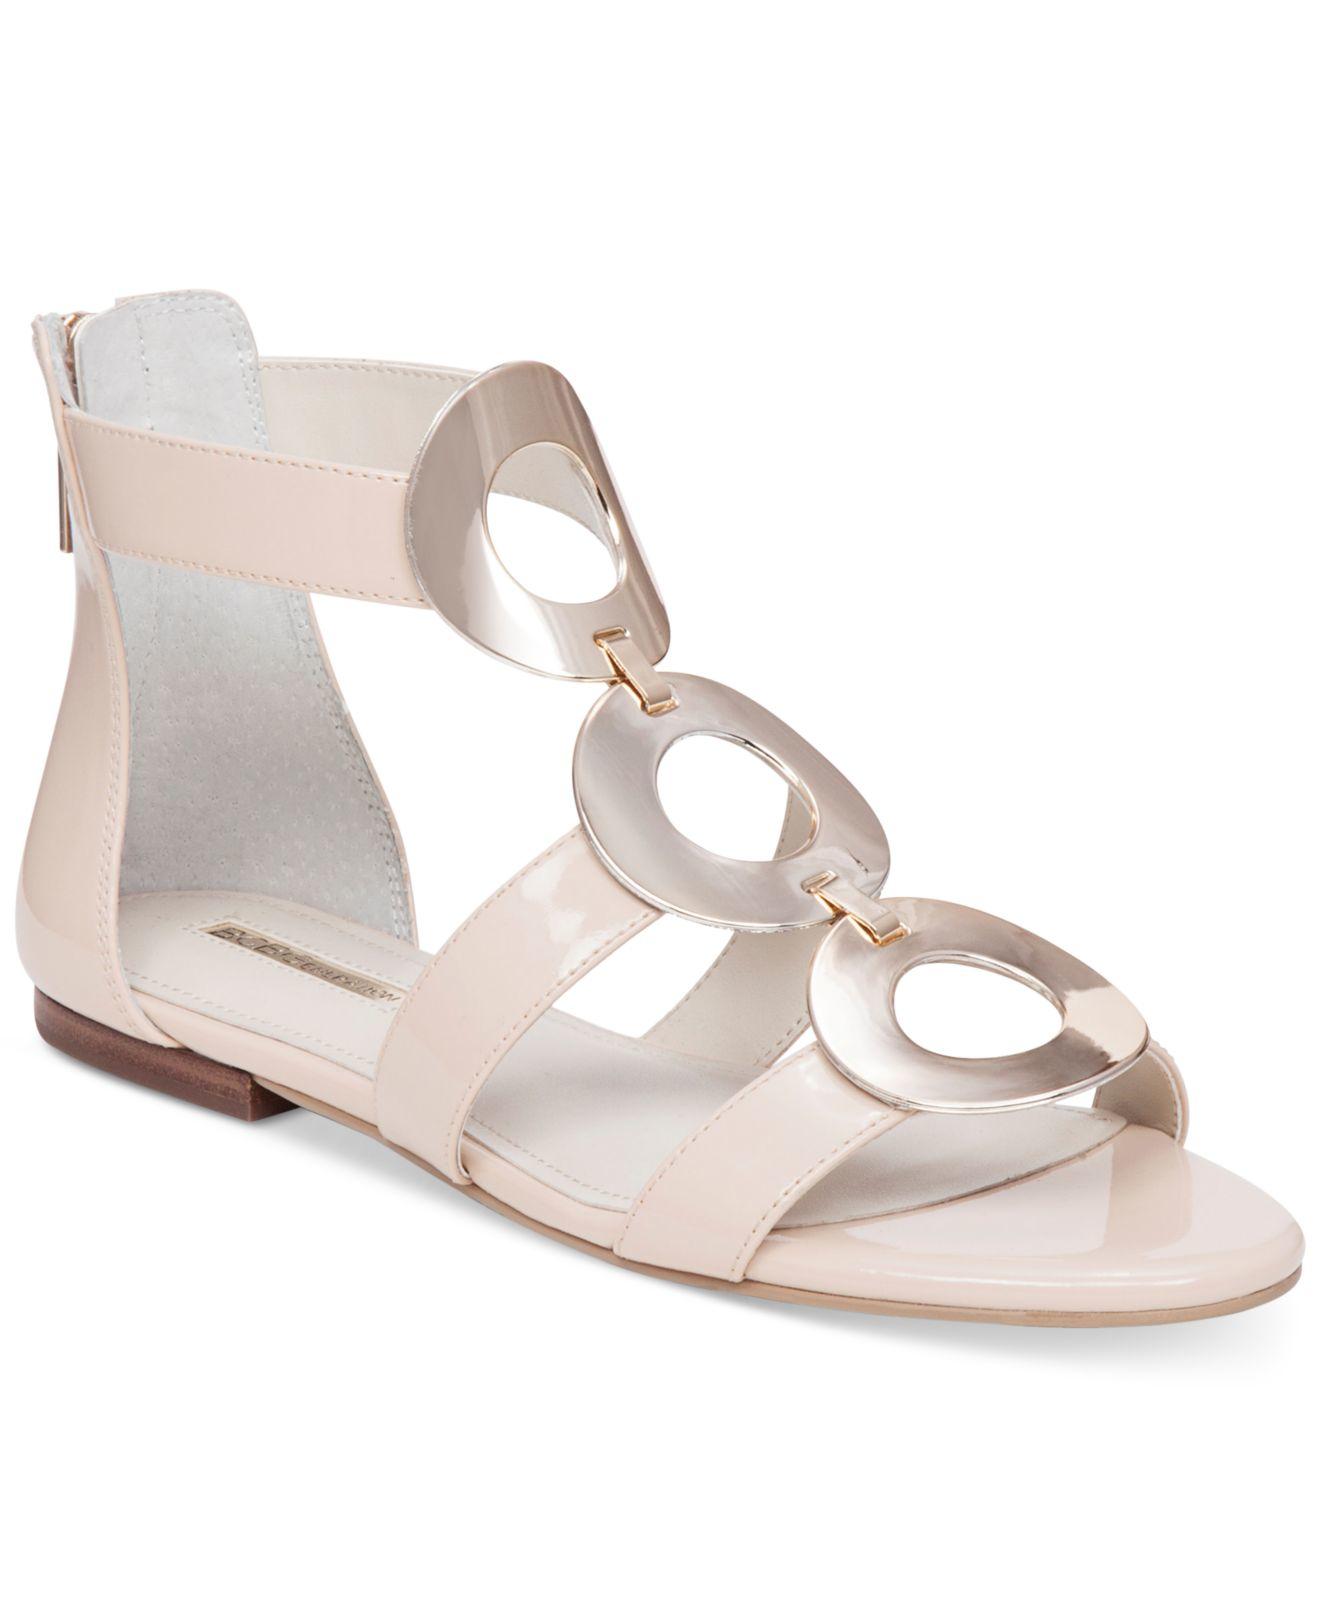 Bcbgeneration Faroh Embellished Flat Sandals In Natural Lyst